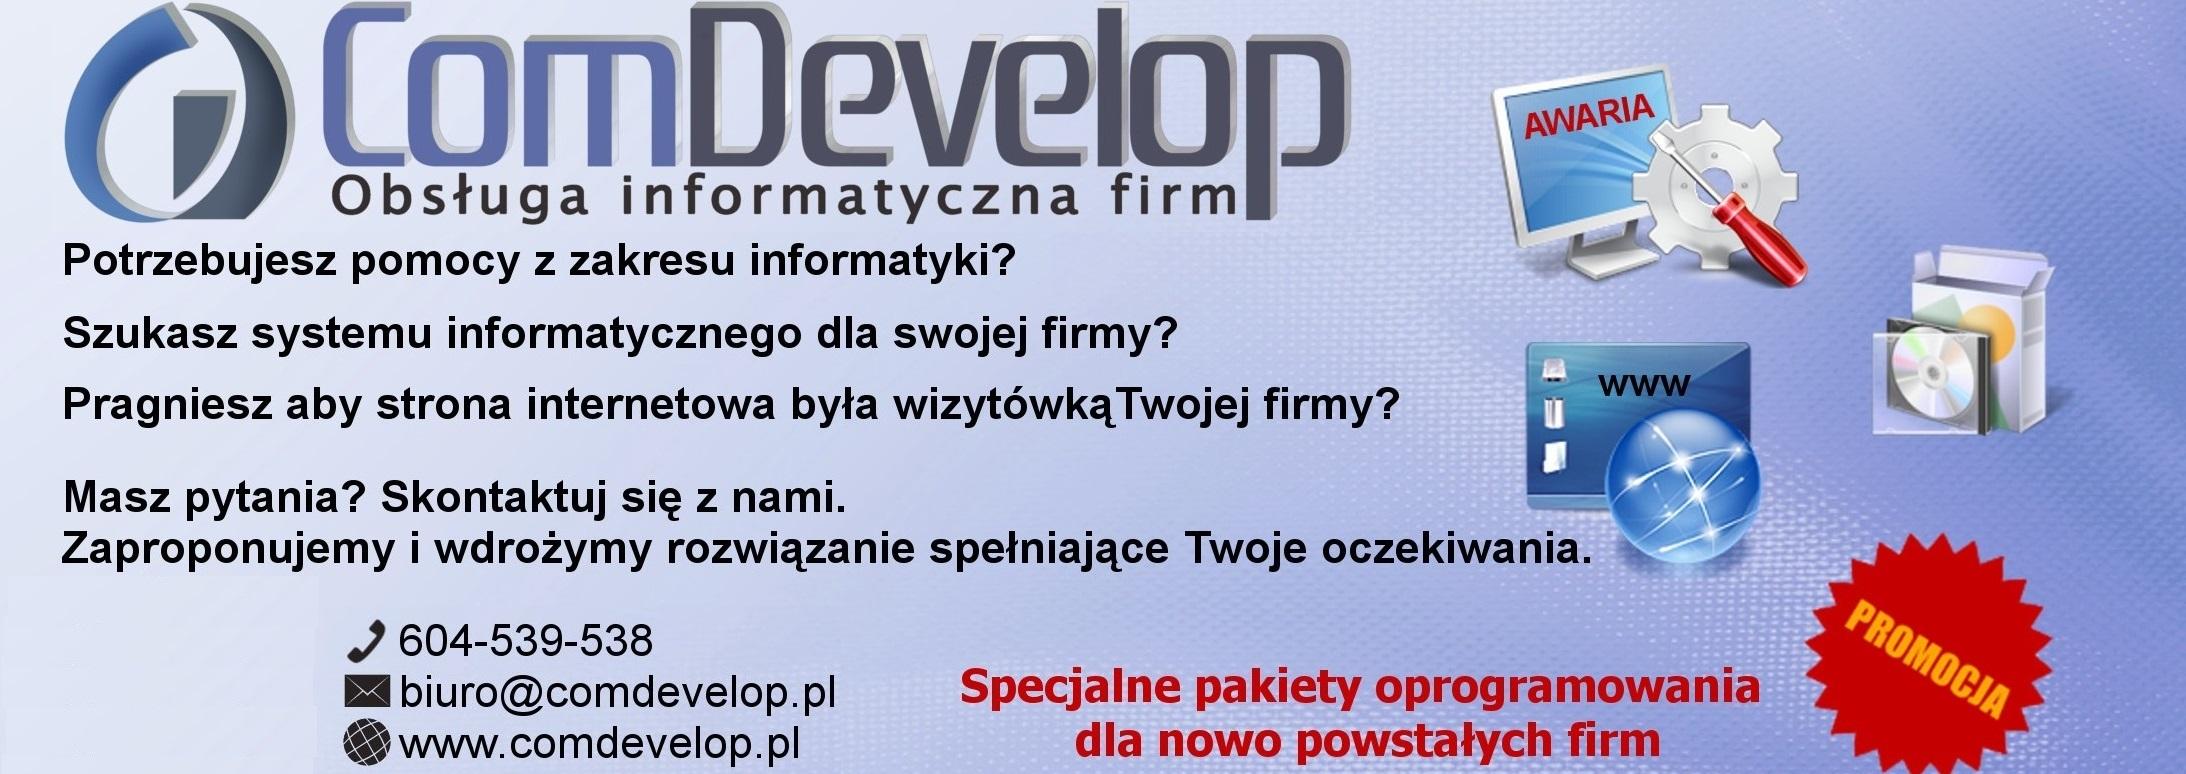 comdevelop_pf